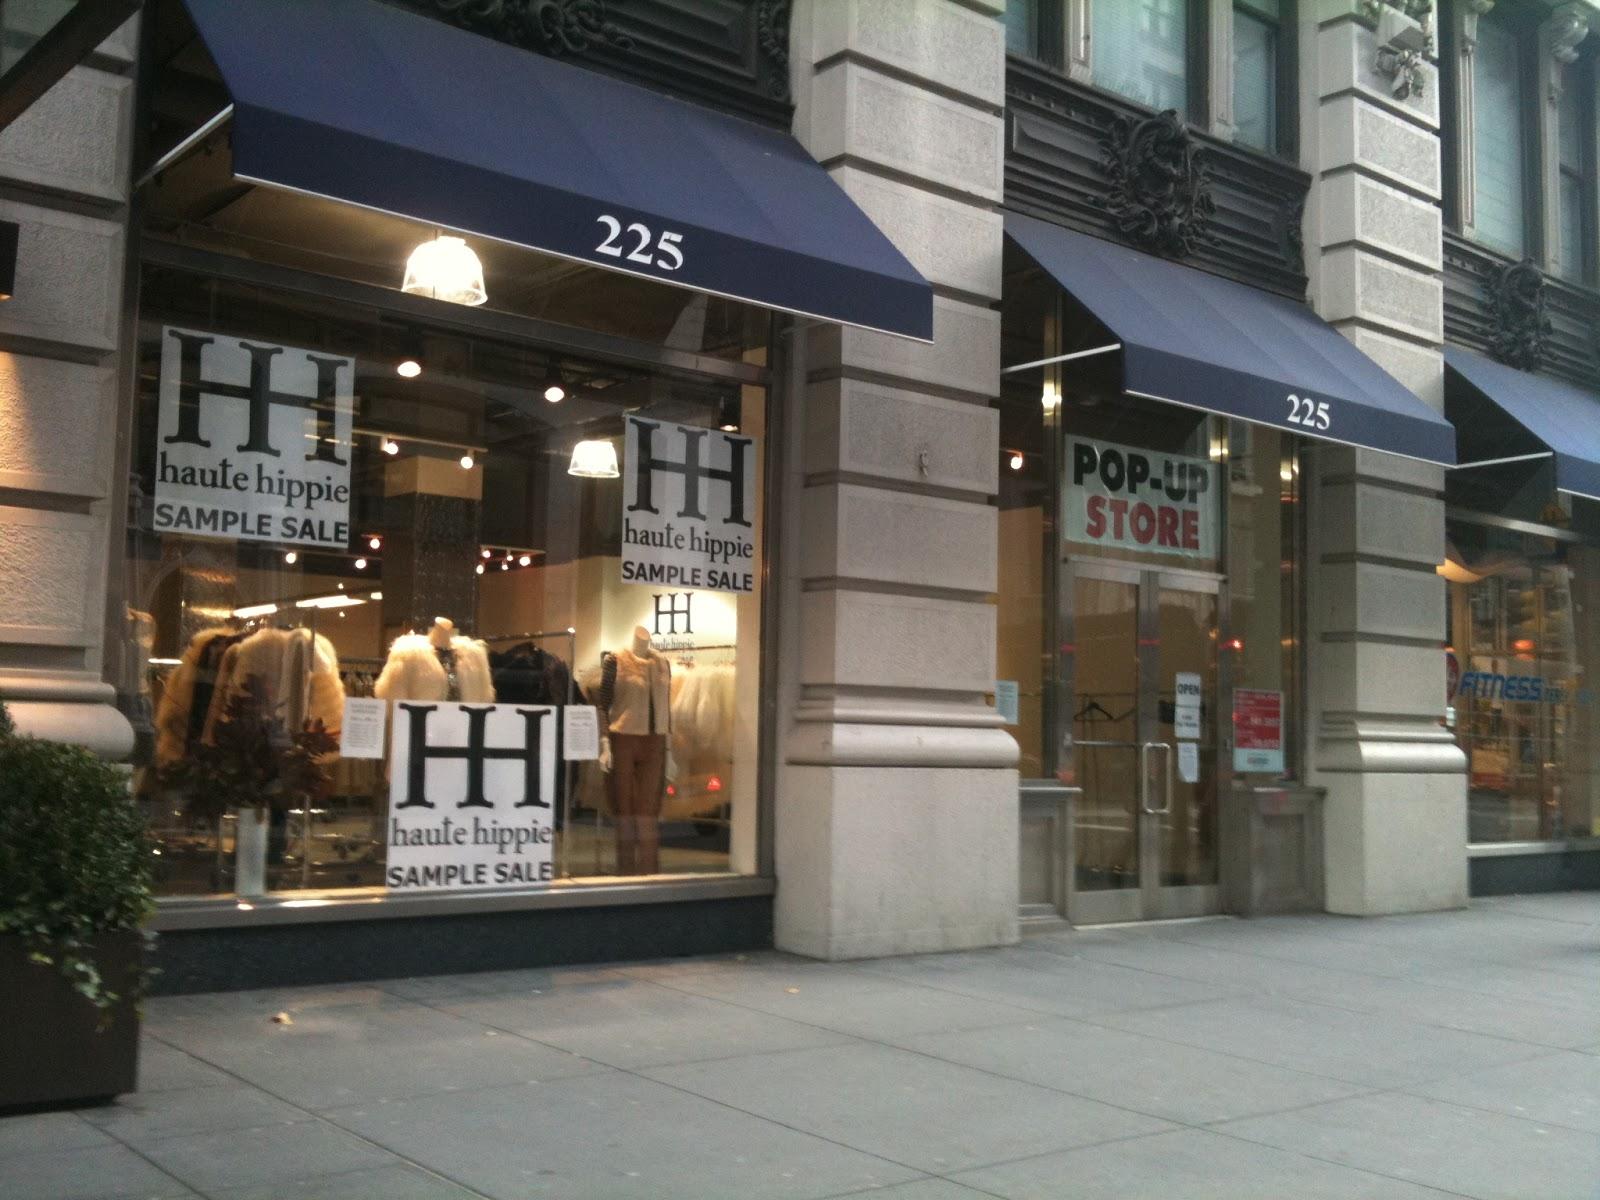 ZoeShopsNYC: 小毛儿报告: Haute Hippie Sample Sale (就算是65% Off ...